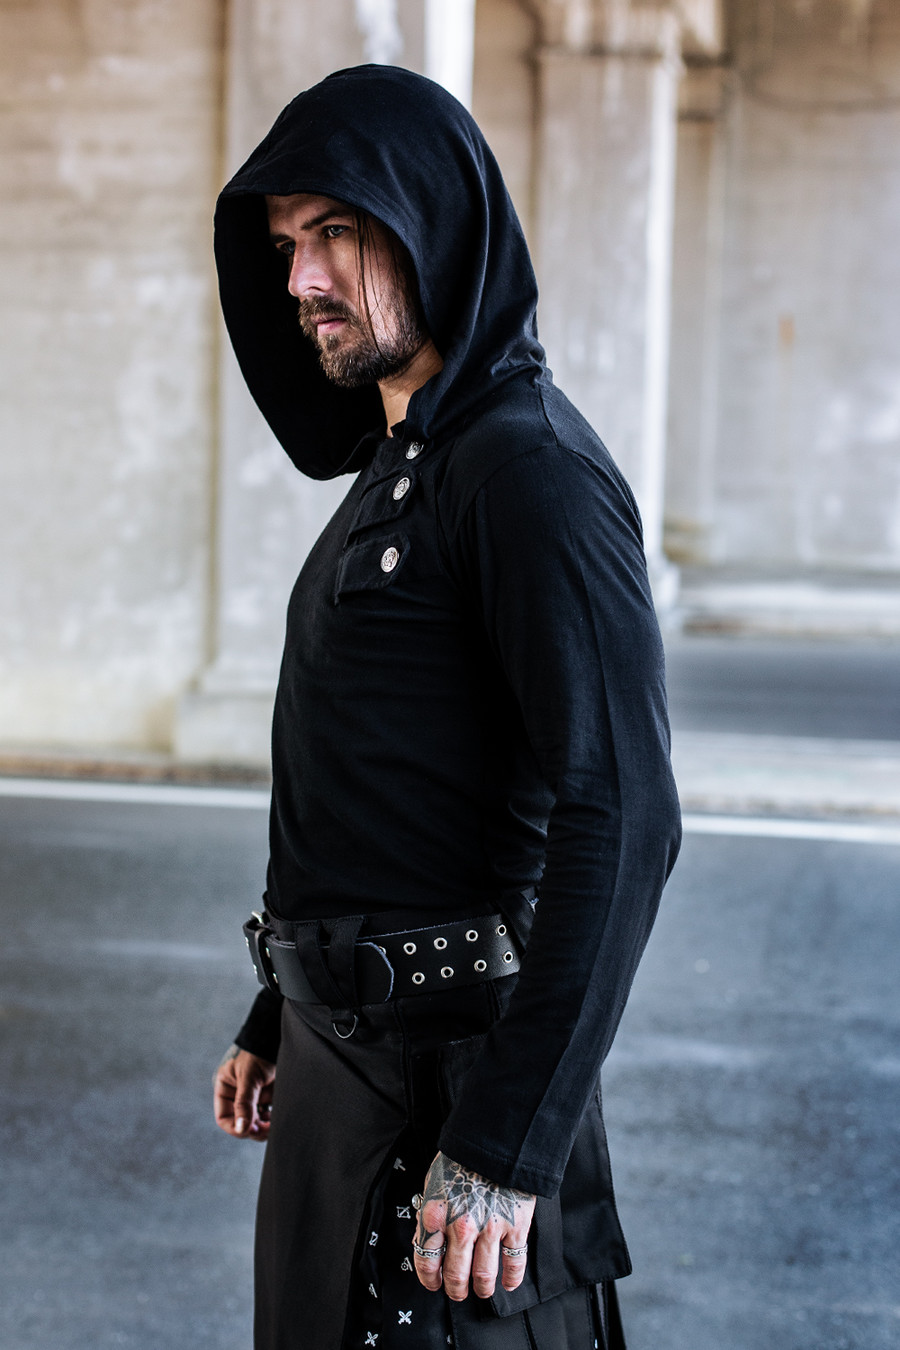 Death Knight Long Shirt